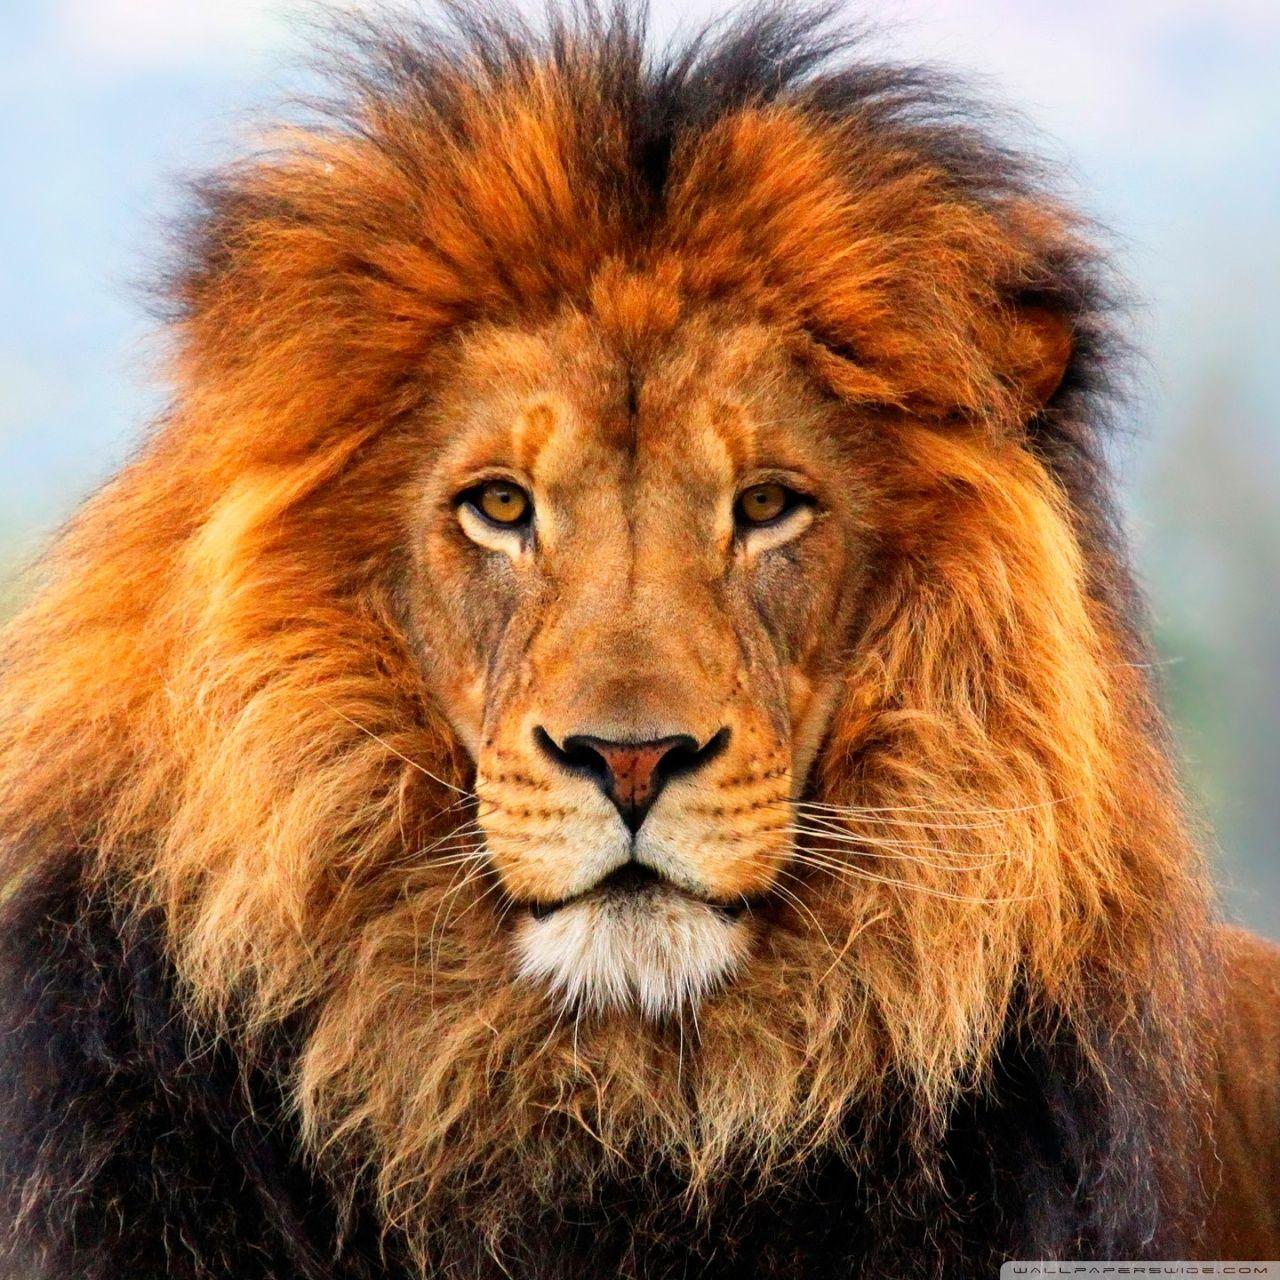 Lion Live Wallpaper Hd Download Lion Live Wallpaper Hd 1 0 With